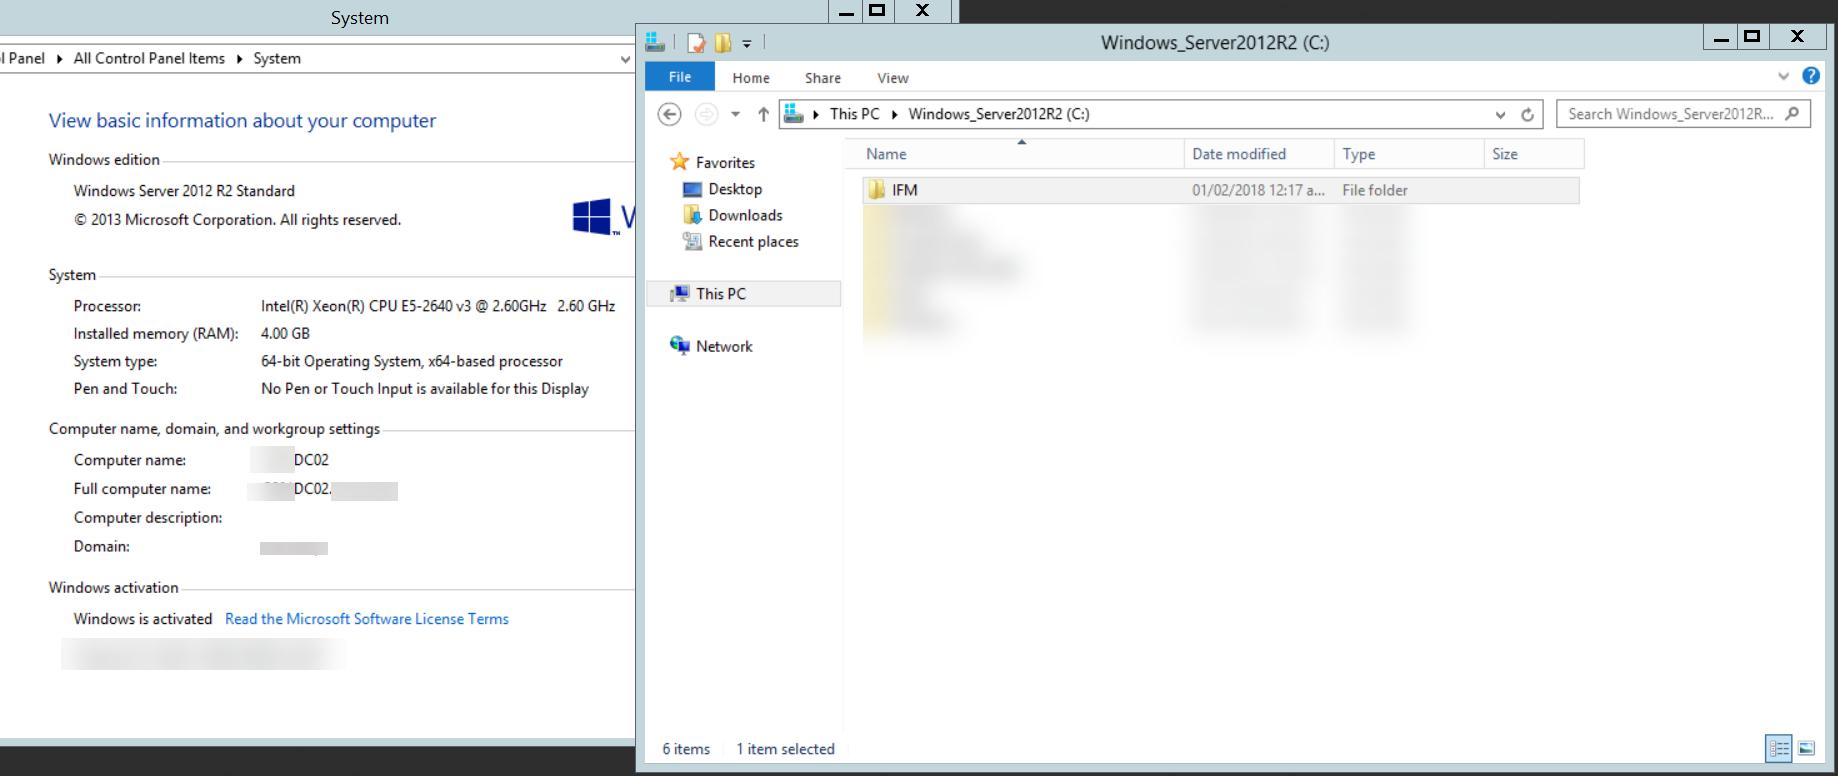 Instalando un Segundo Controlador de Dominio con IFM, [Windows Server 2012 R2] – Instalando un Segundo Controlador de Dominio con IFM, ElCegu, ElCegu